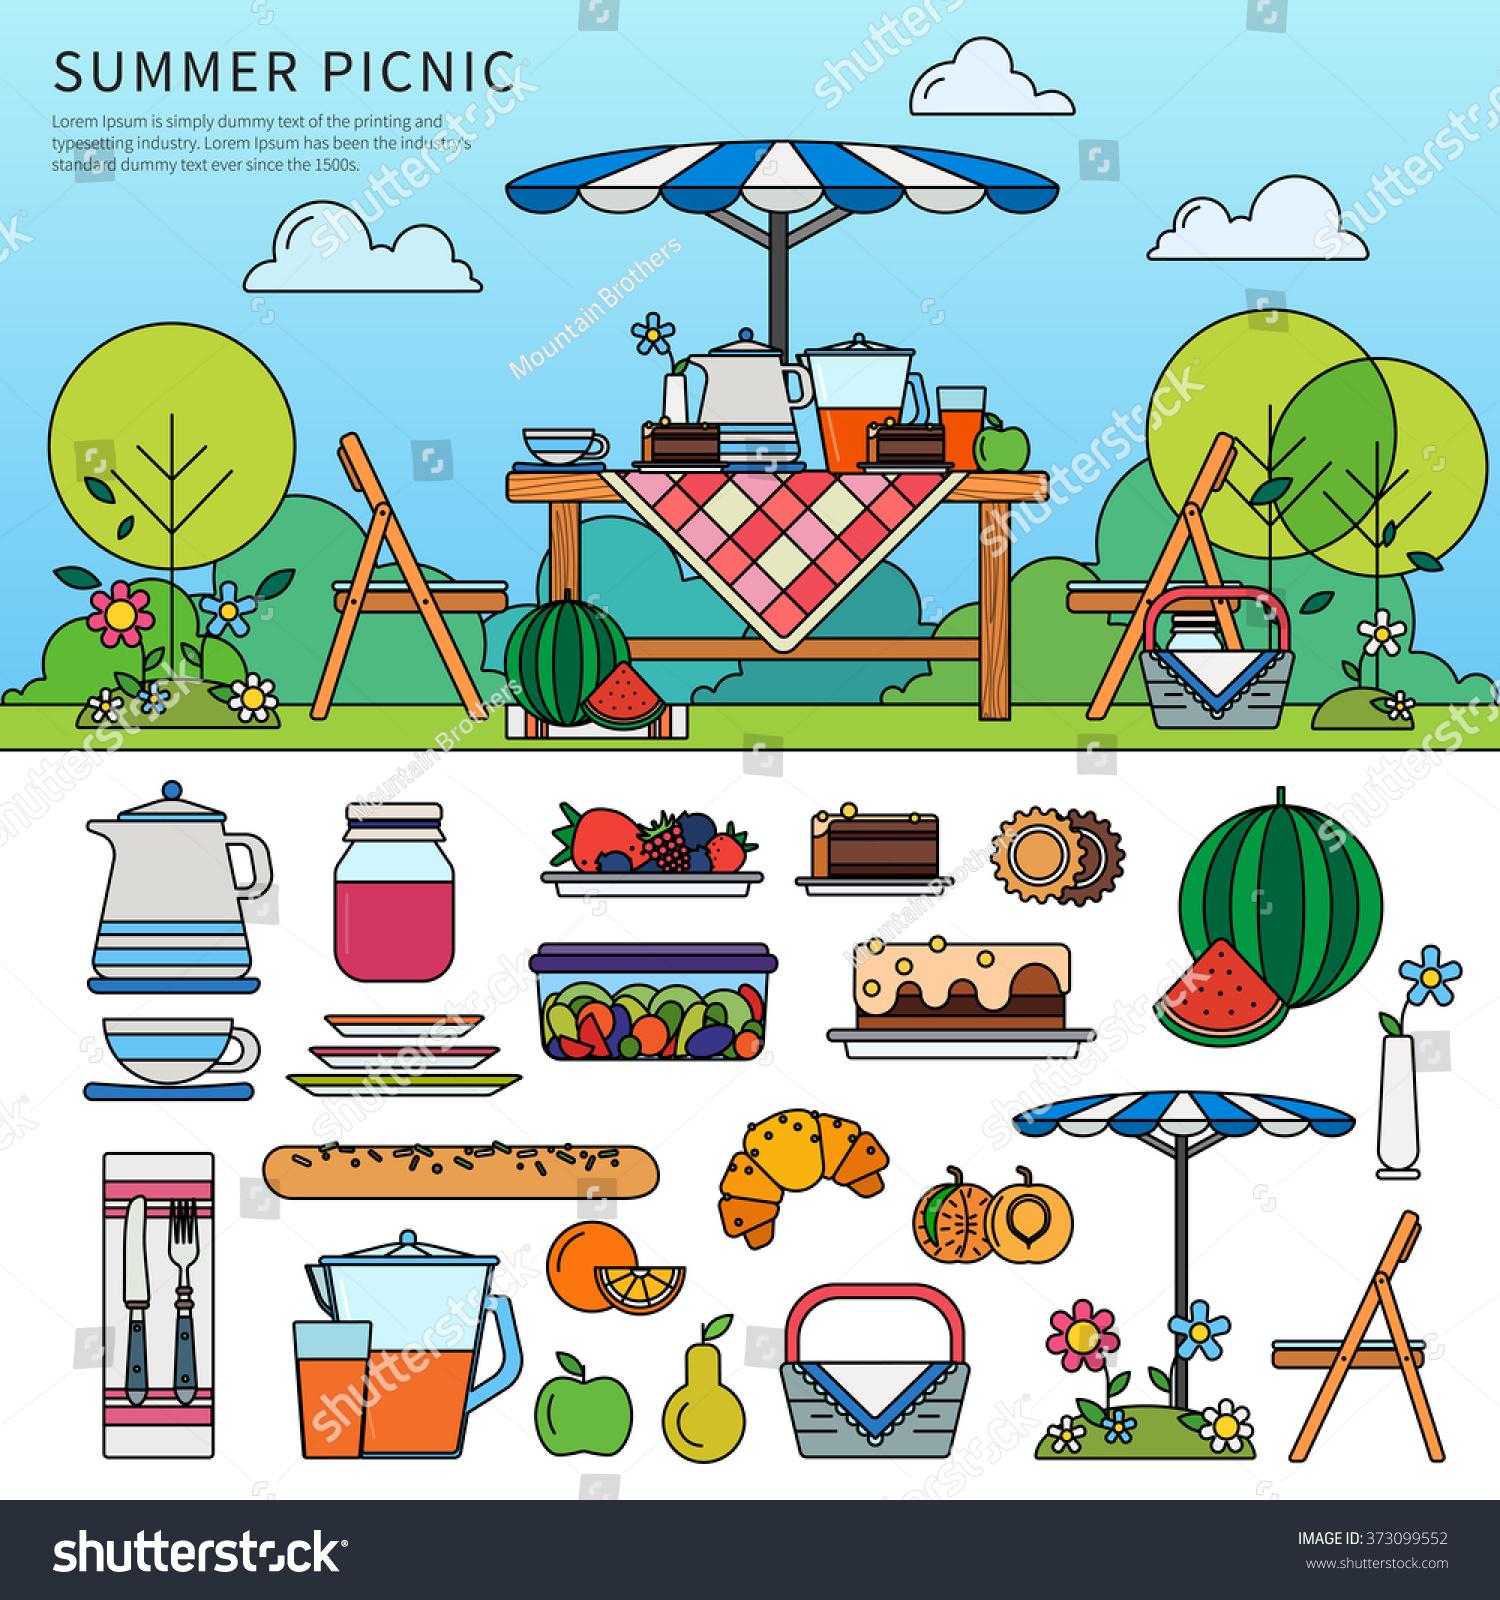 Landscape Design In A Day: Thin Line Flat Design Summer Picnic Stock Vector 373099552